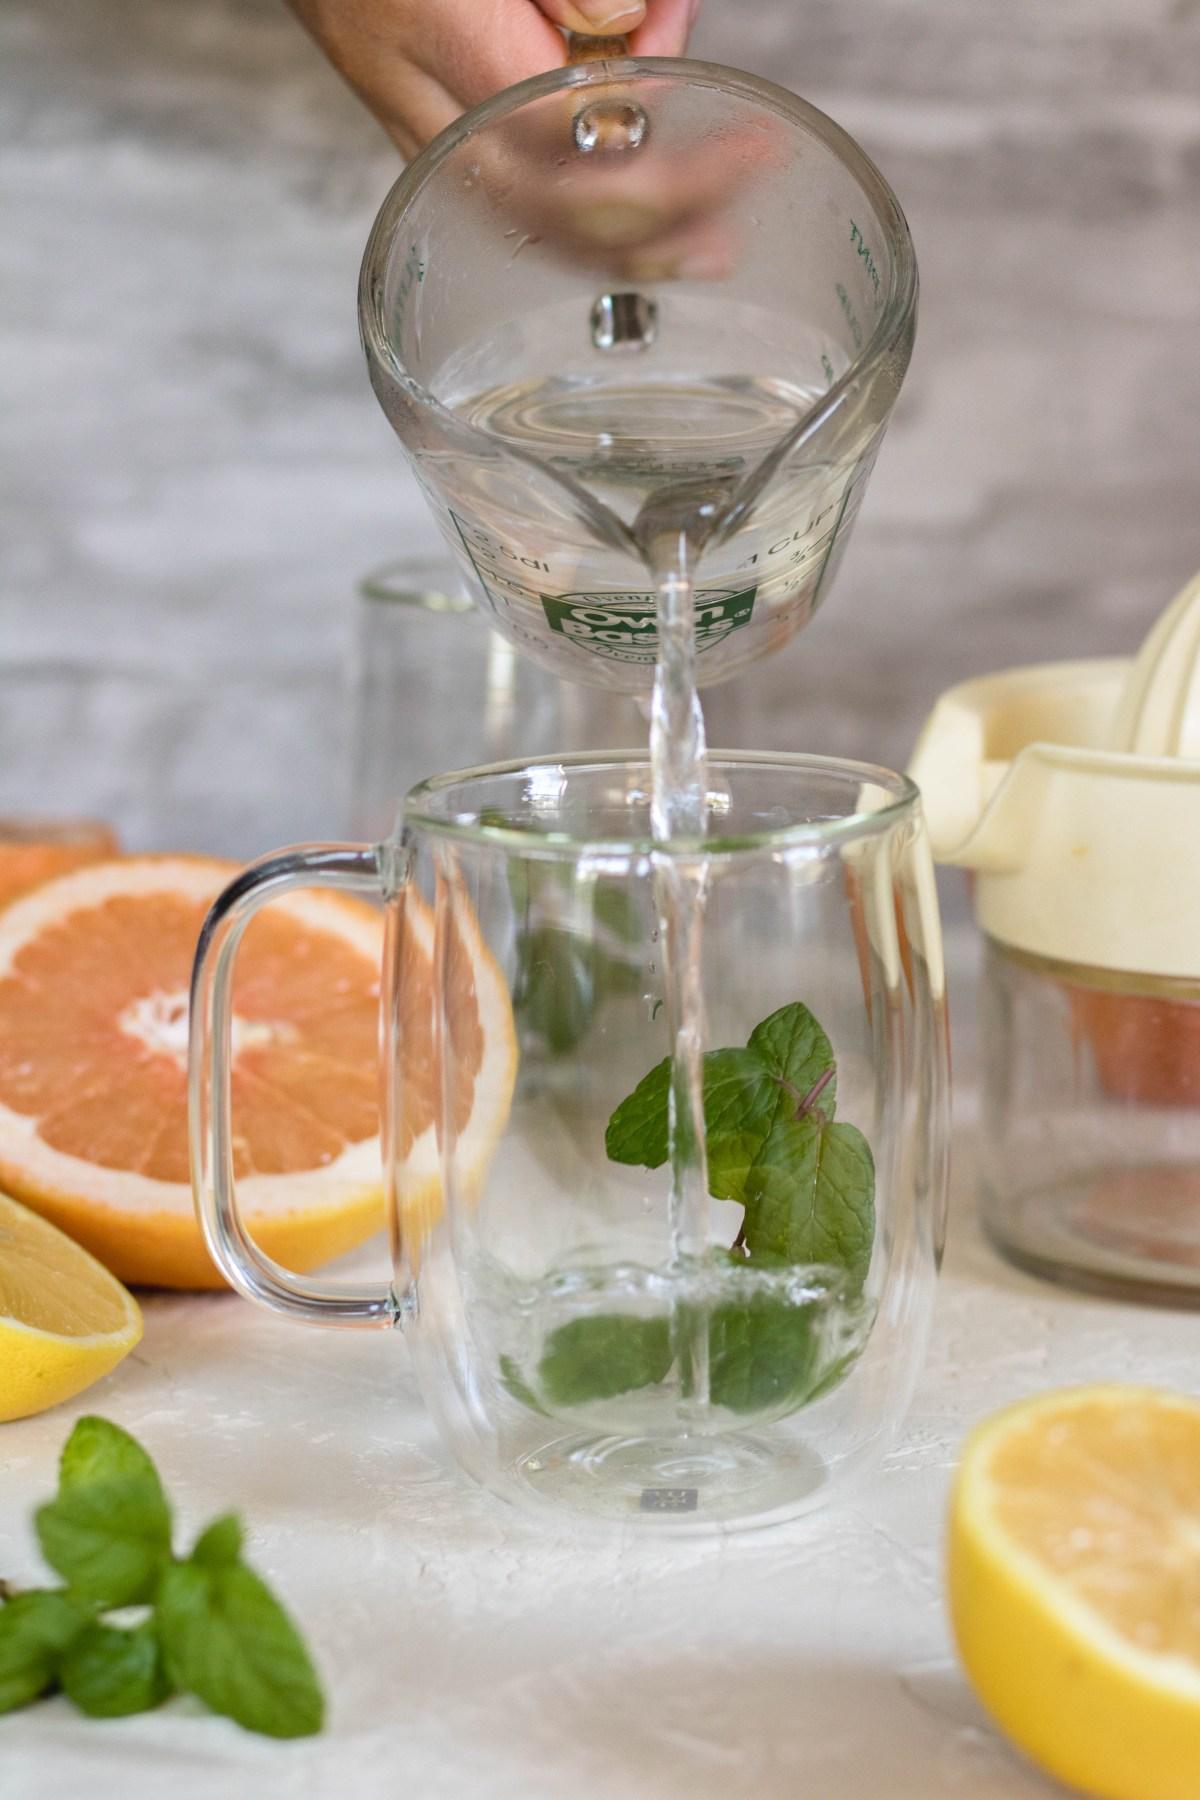 Making mint tea for detox grapefruit tea